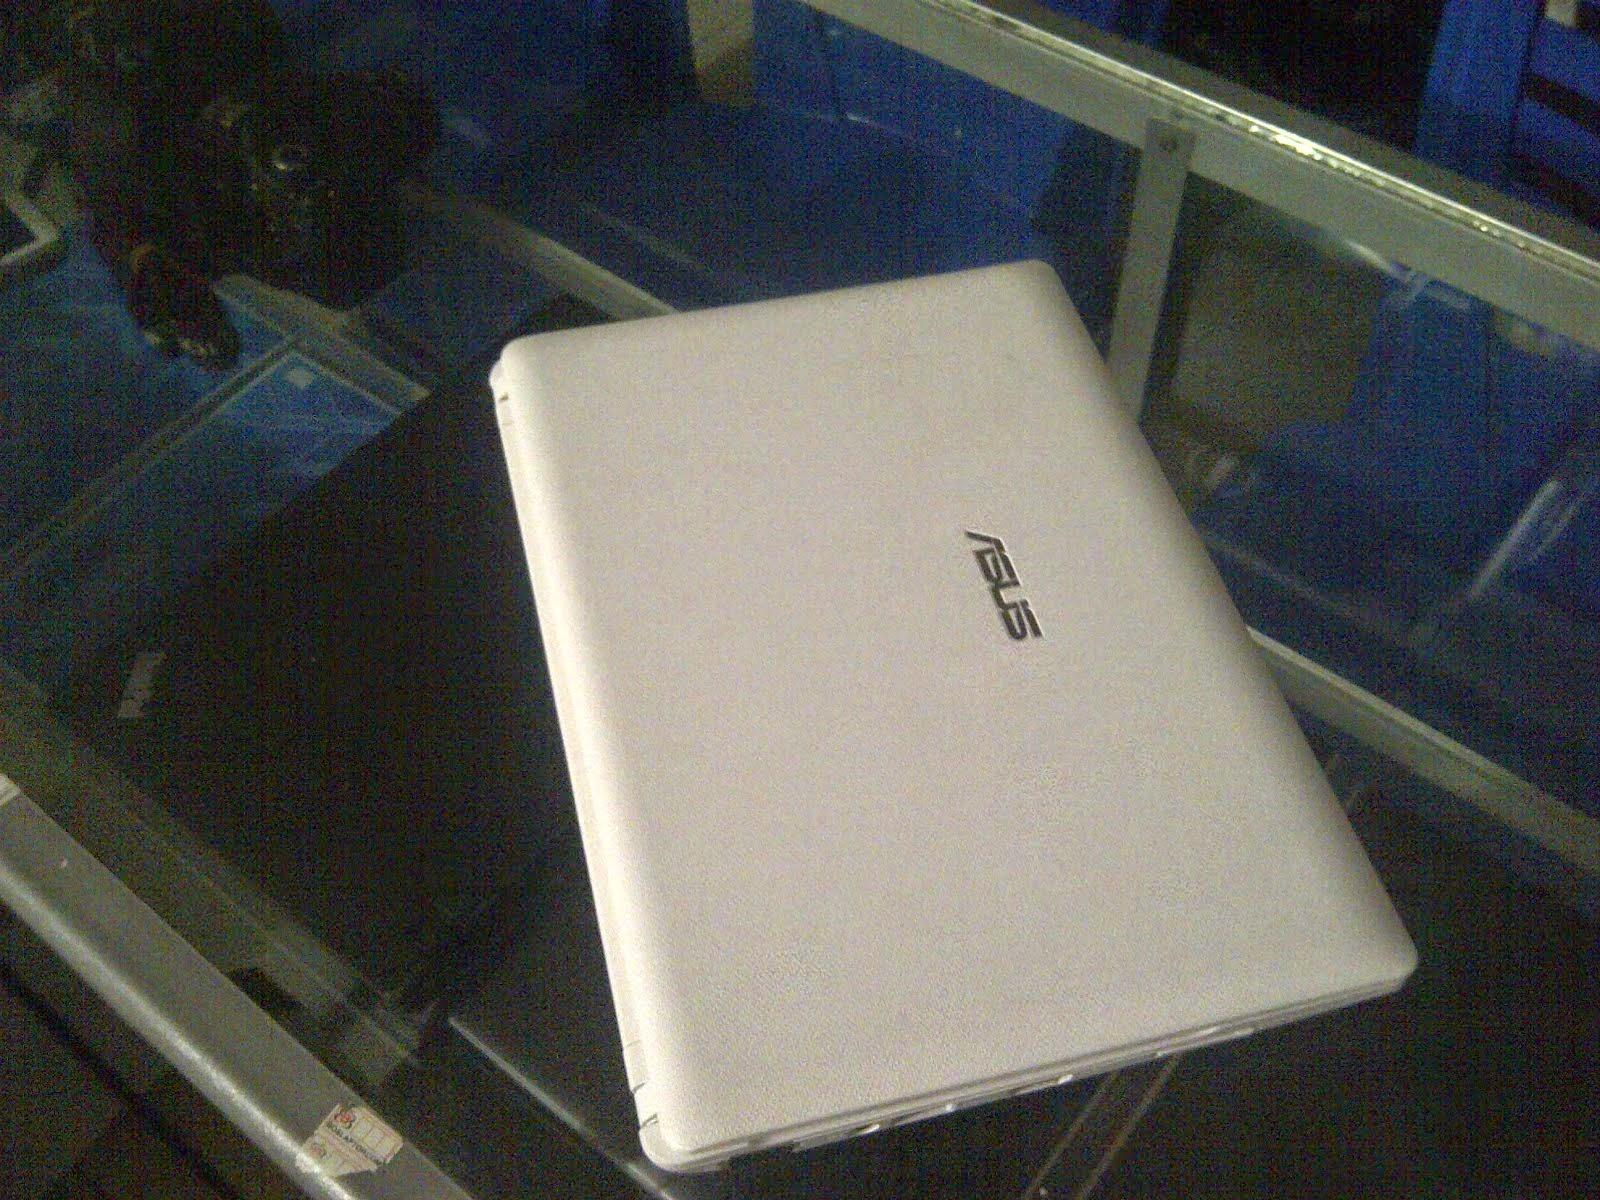 Pusat Sparepart Laptop Kamera Service Jual Polytron W1400 Android Asus 1015px Netbook Bekas